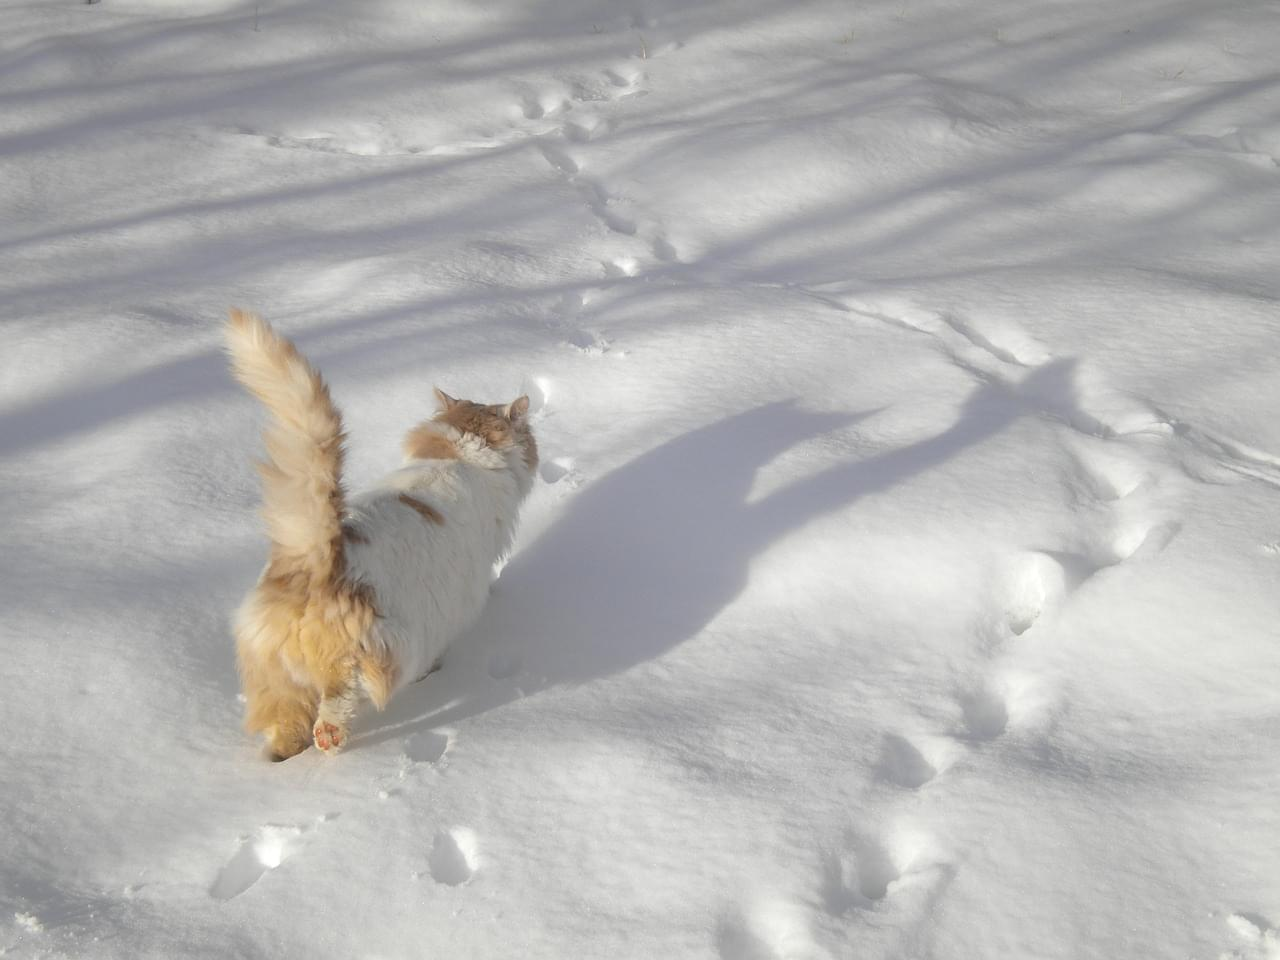 cat-walking-2141556_1280